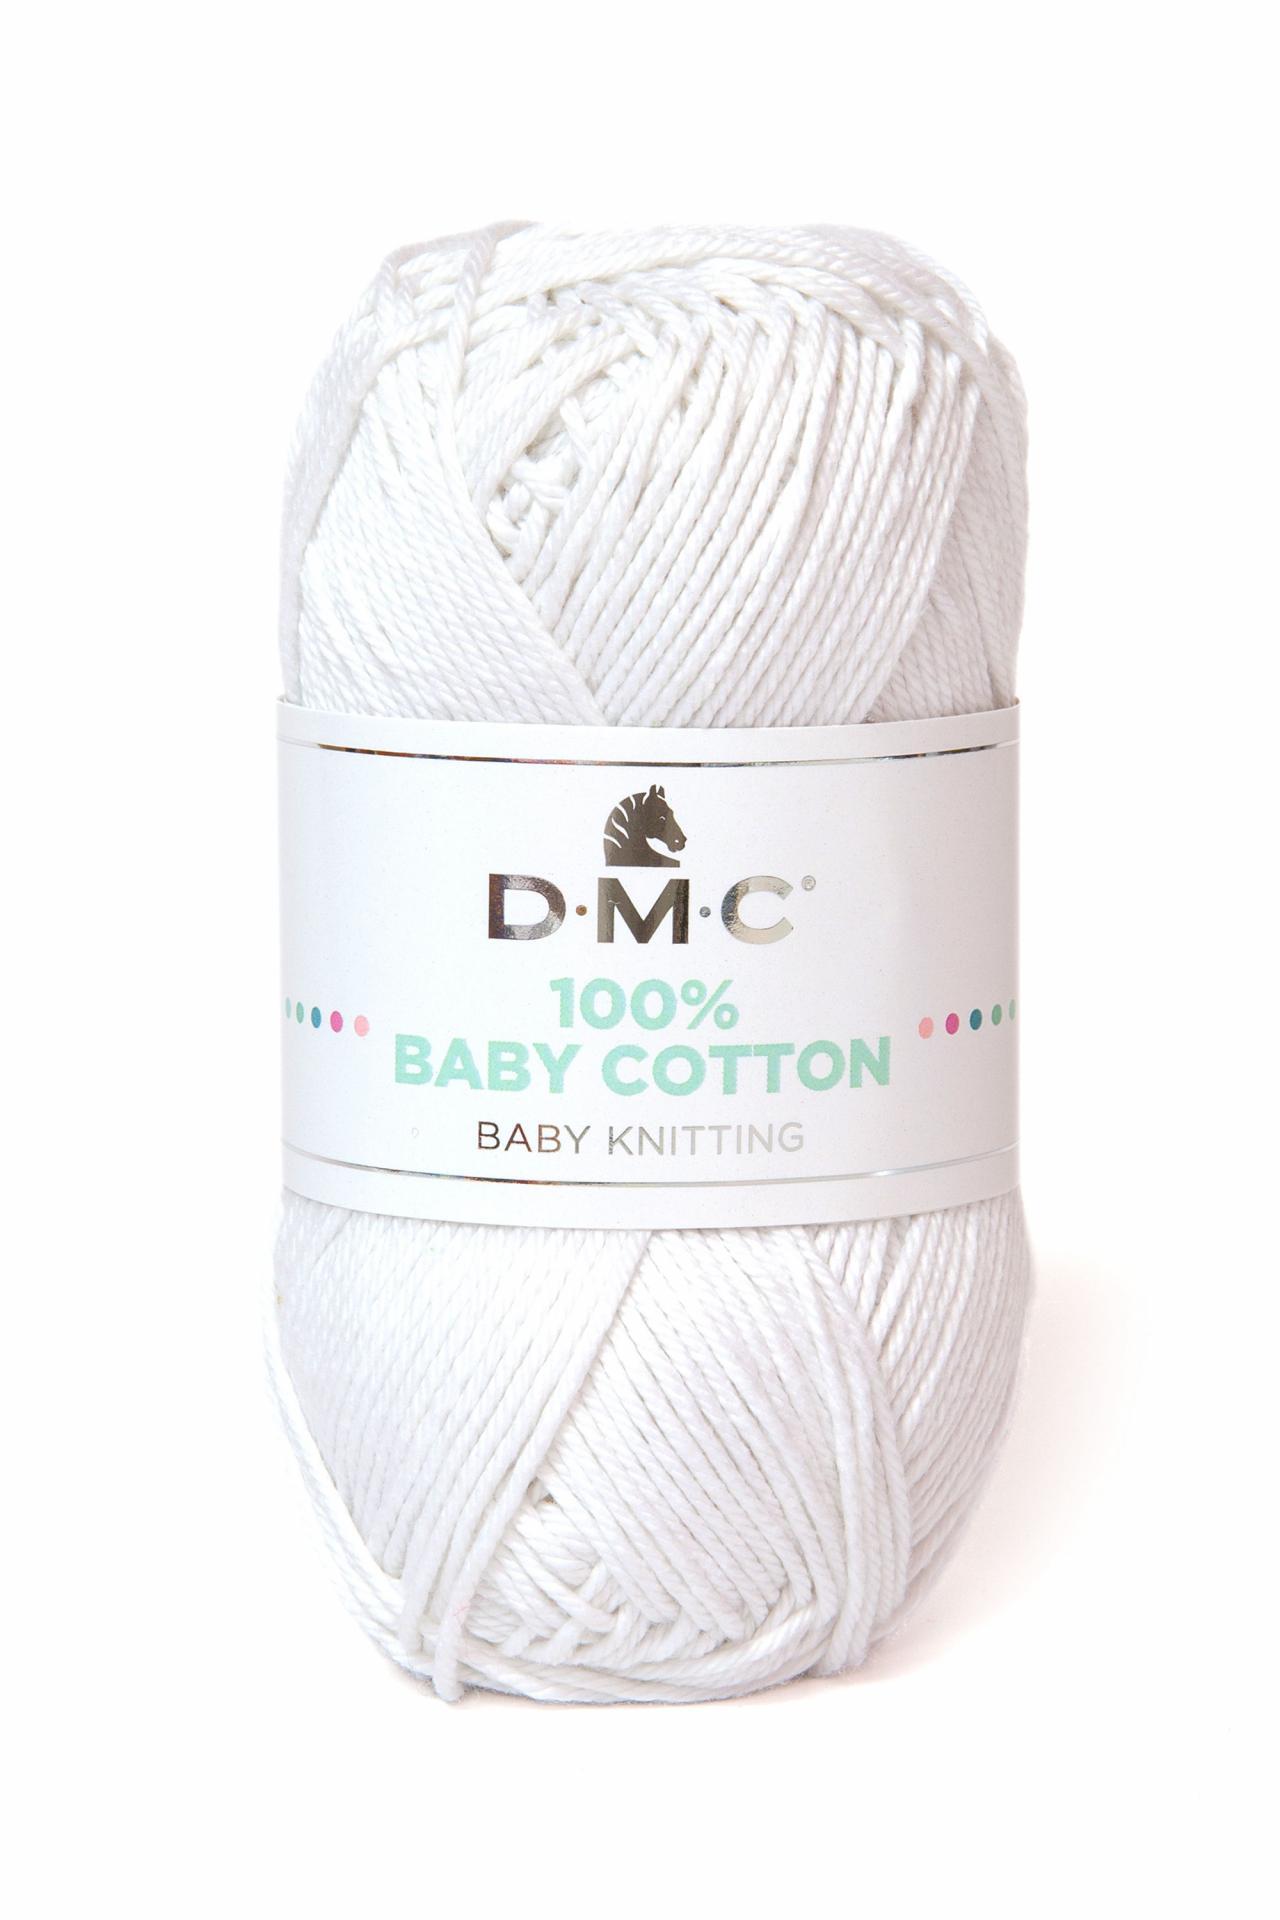 Hilo DMC 100% Baby Cotton 762 Blanco